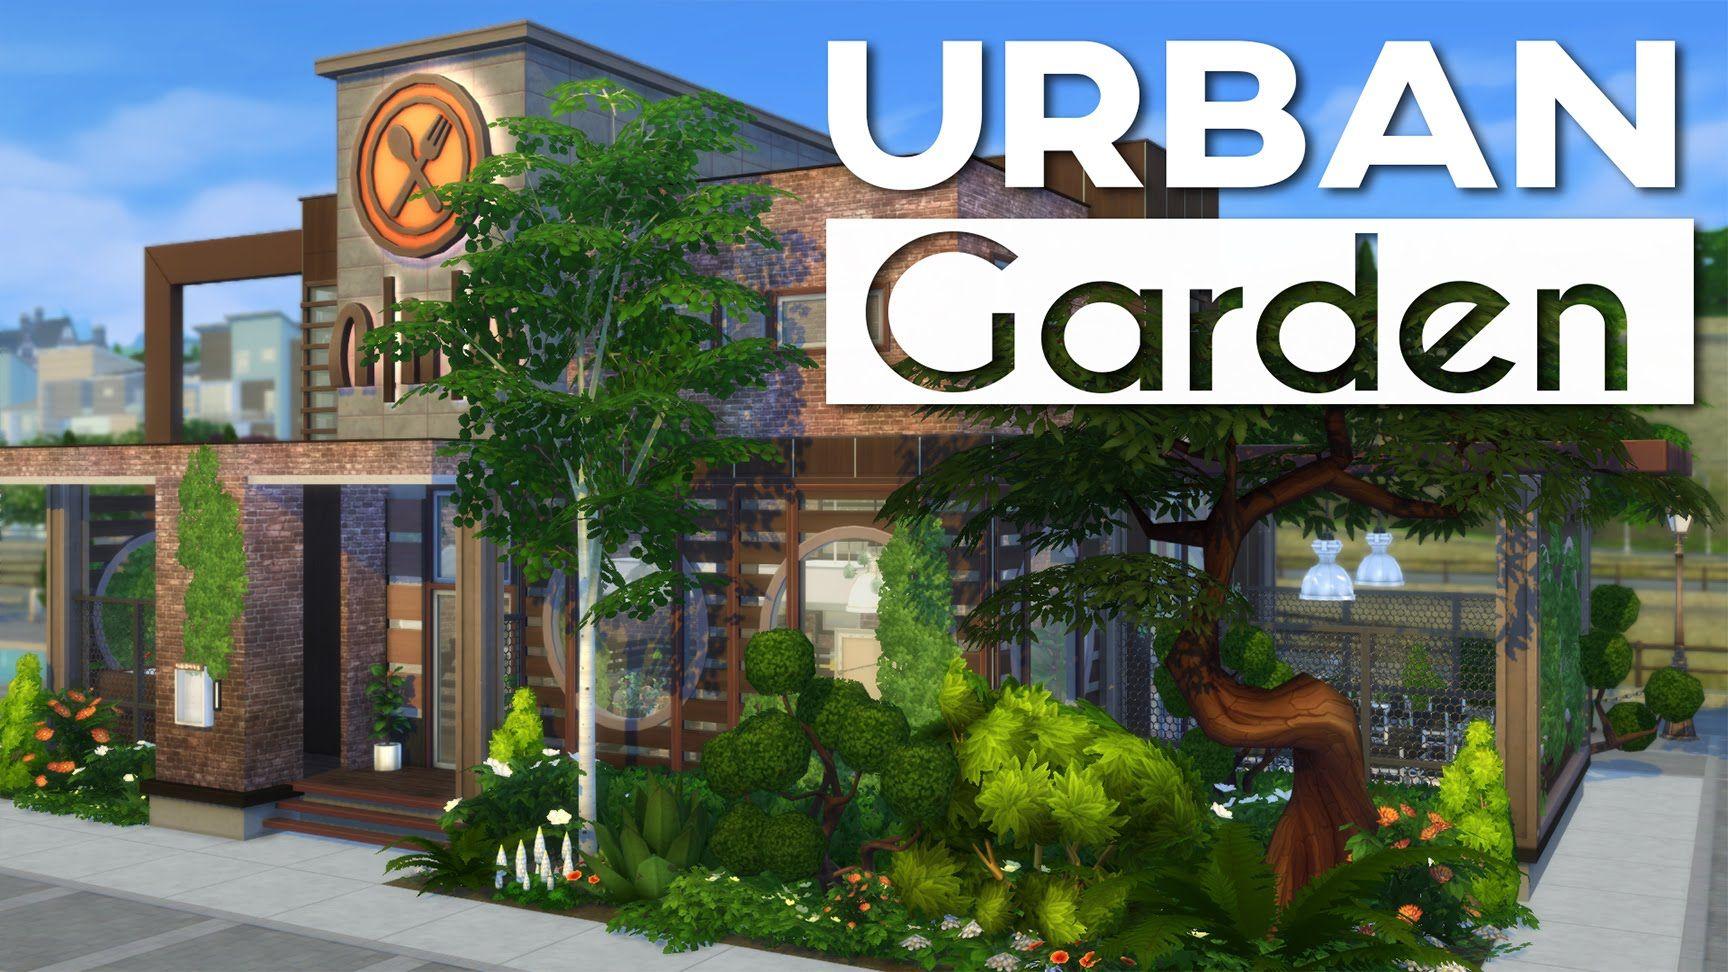 The Sims 4 Restaurant Build Urban Garden Sims 4 Restaurant